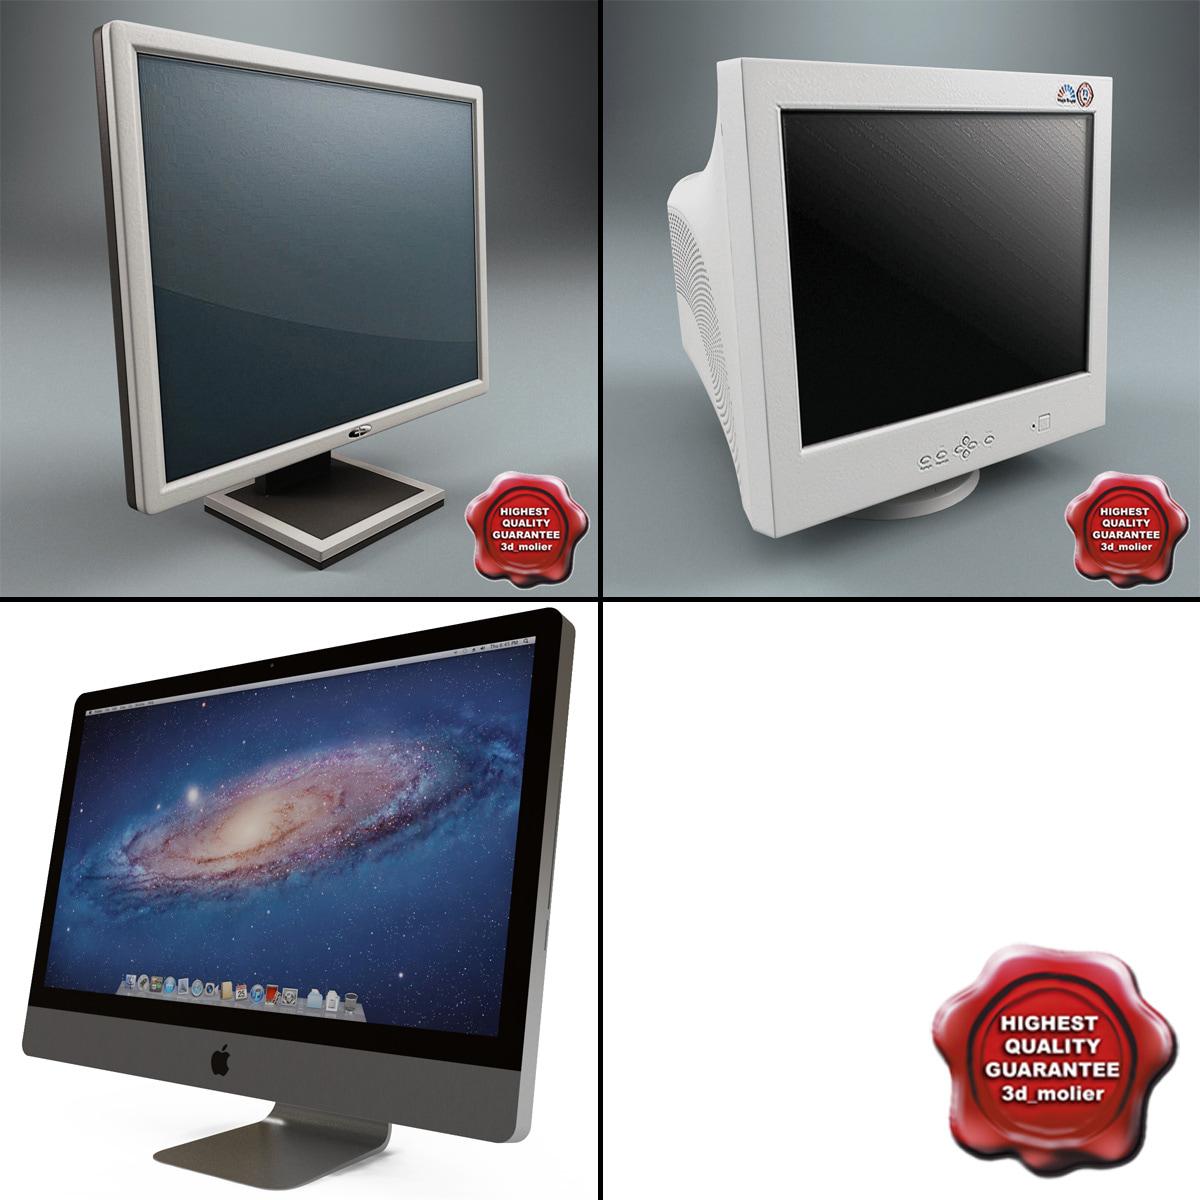 Computer_Monitors_Collection_V2_000.jpg